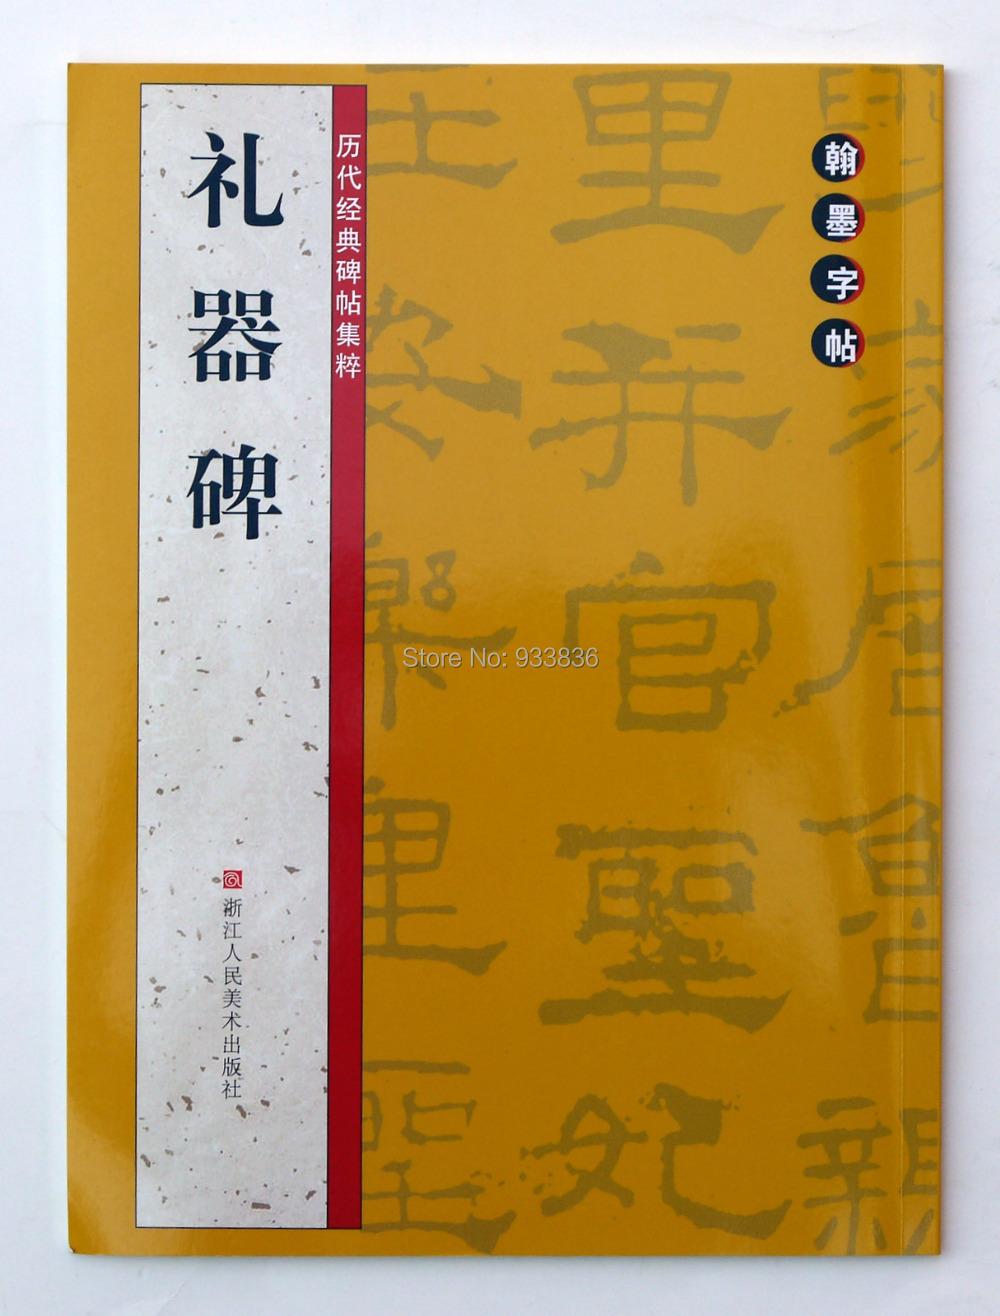 Chinese calligraphy book li qi bei shu clerical script